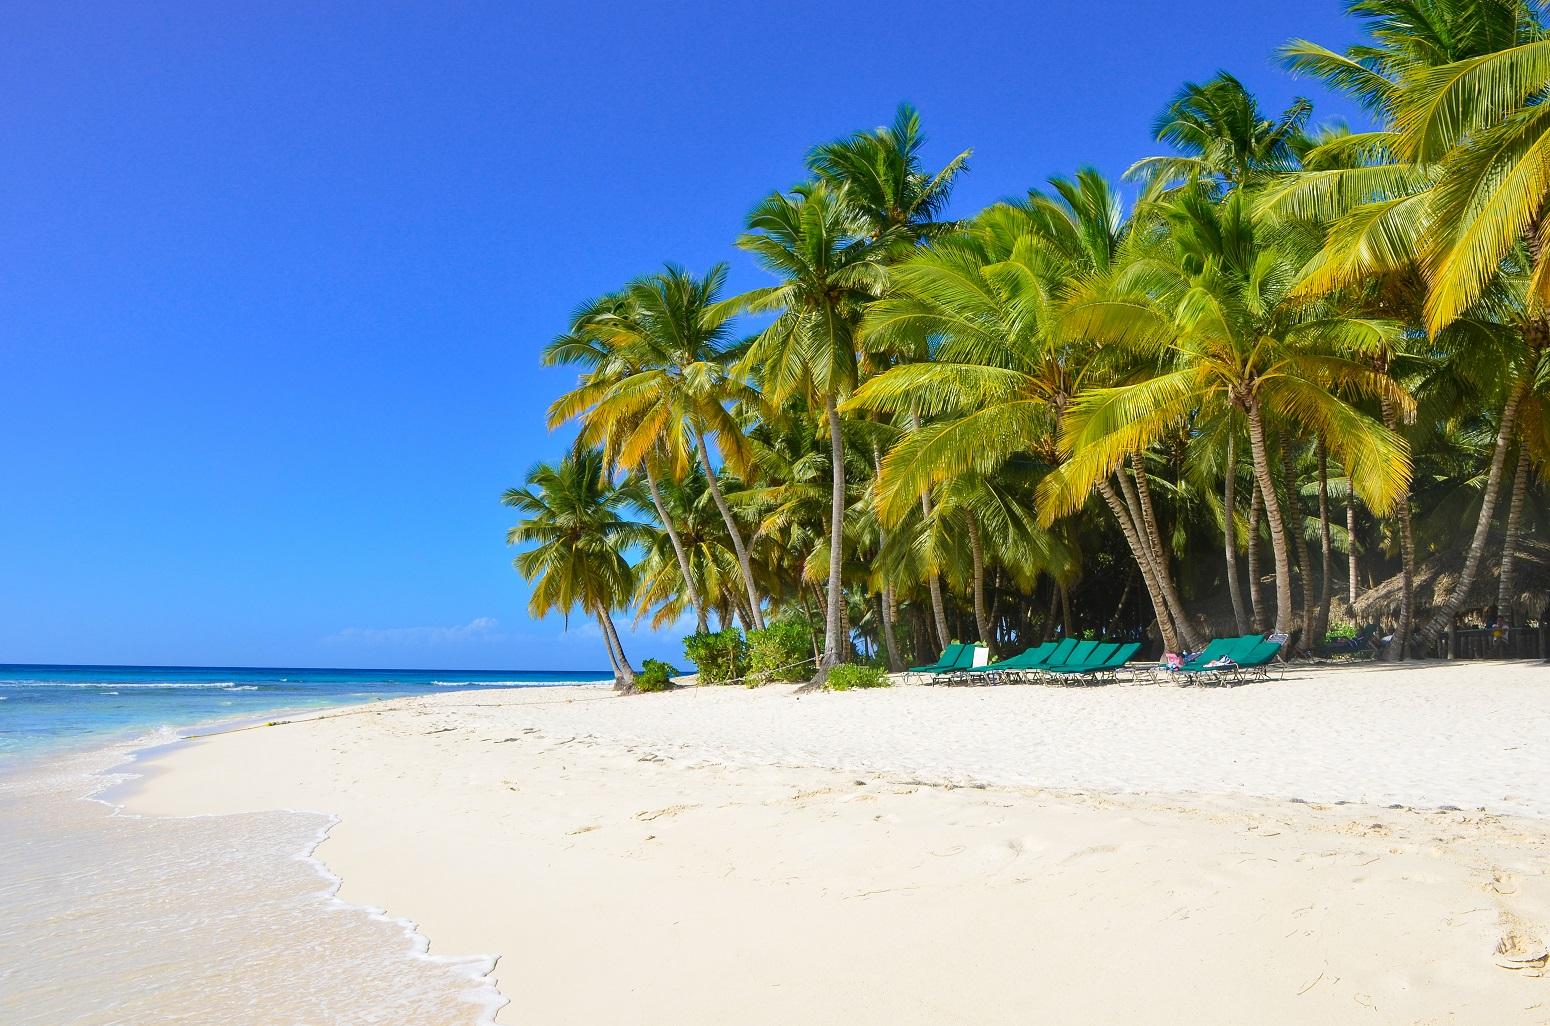 isla saona tropical